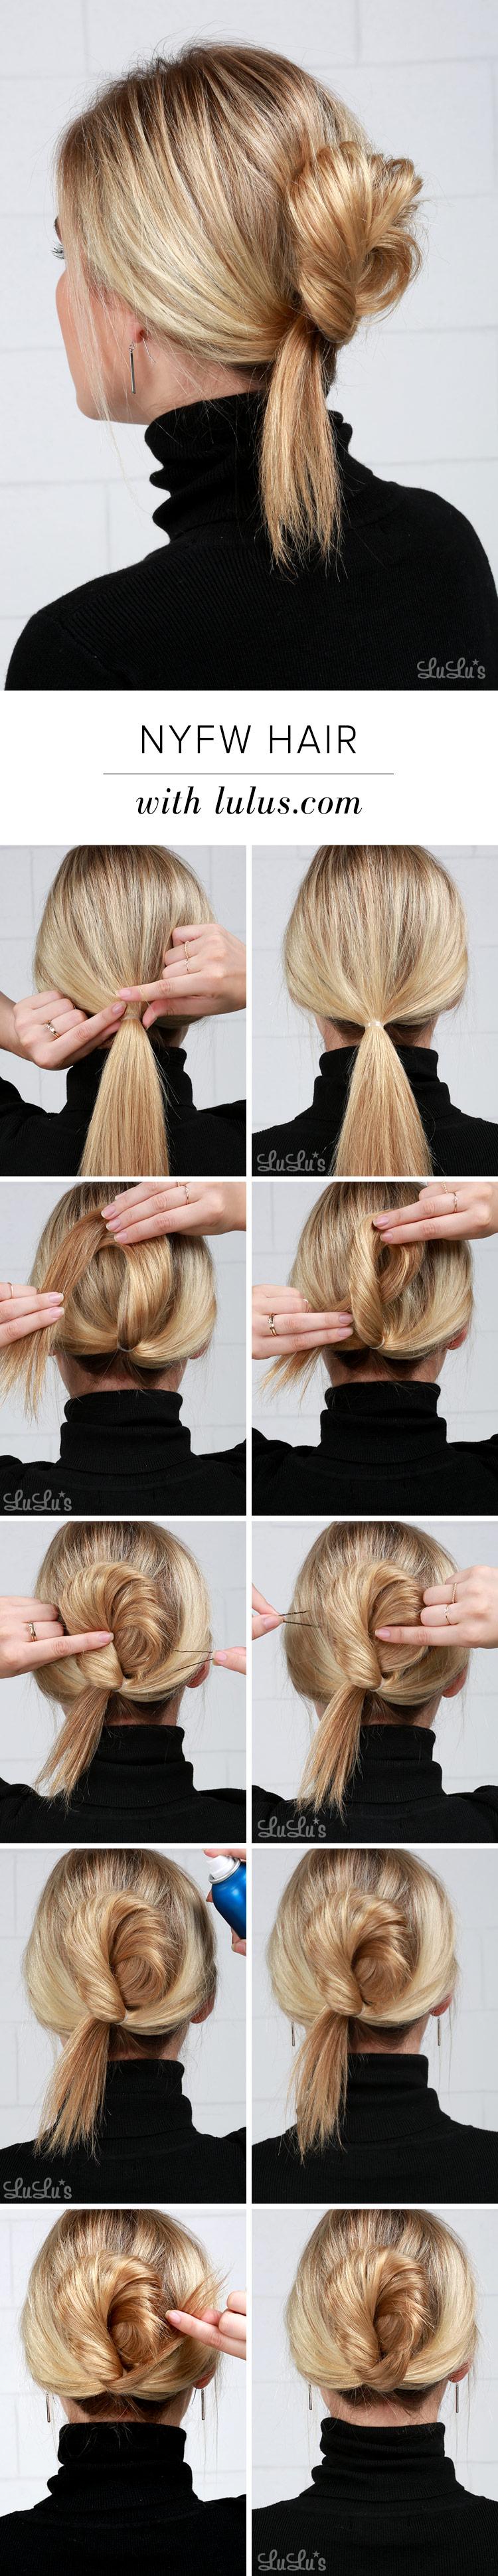 NYFW Inspired Hair